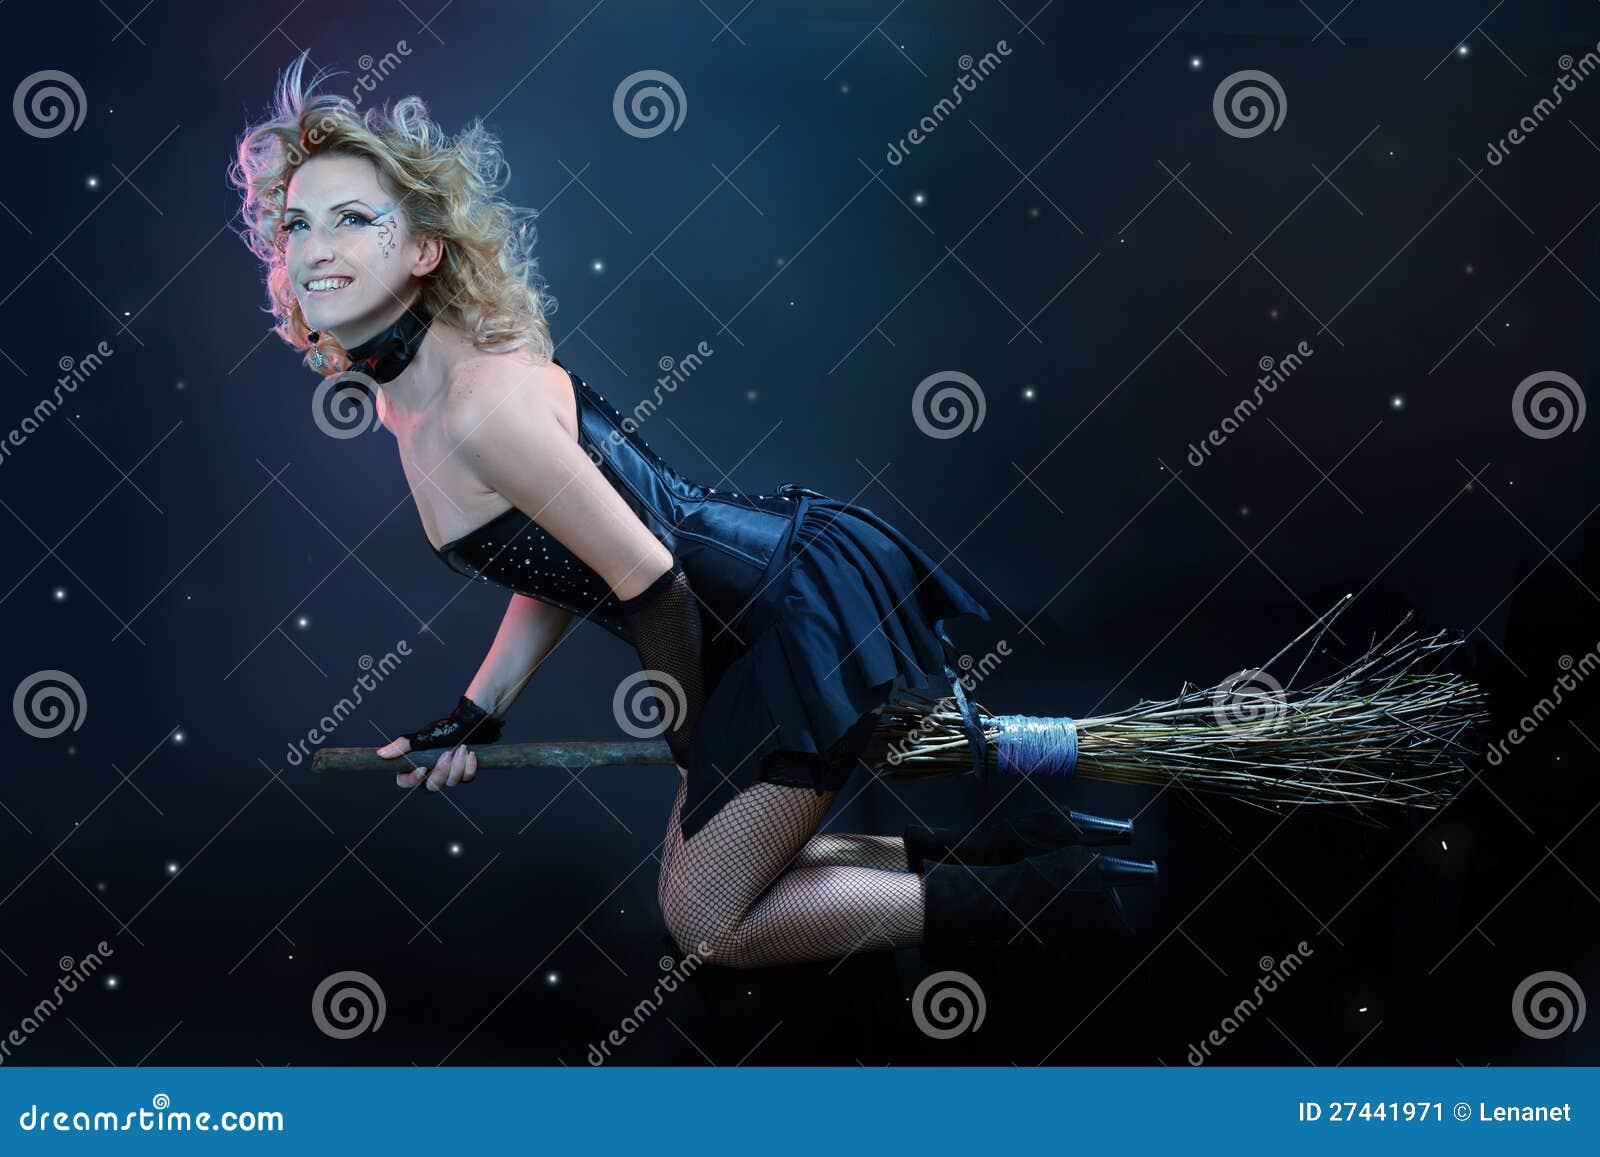 girl fucking a broom